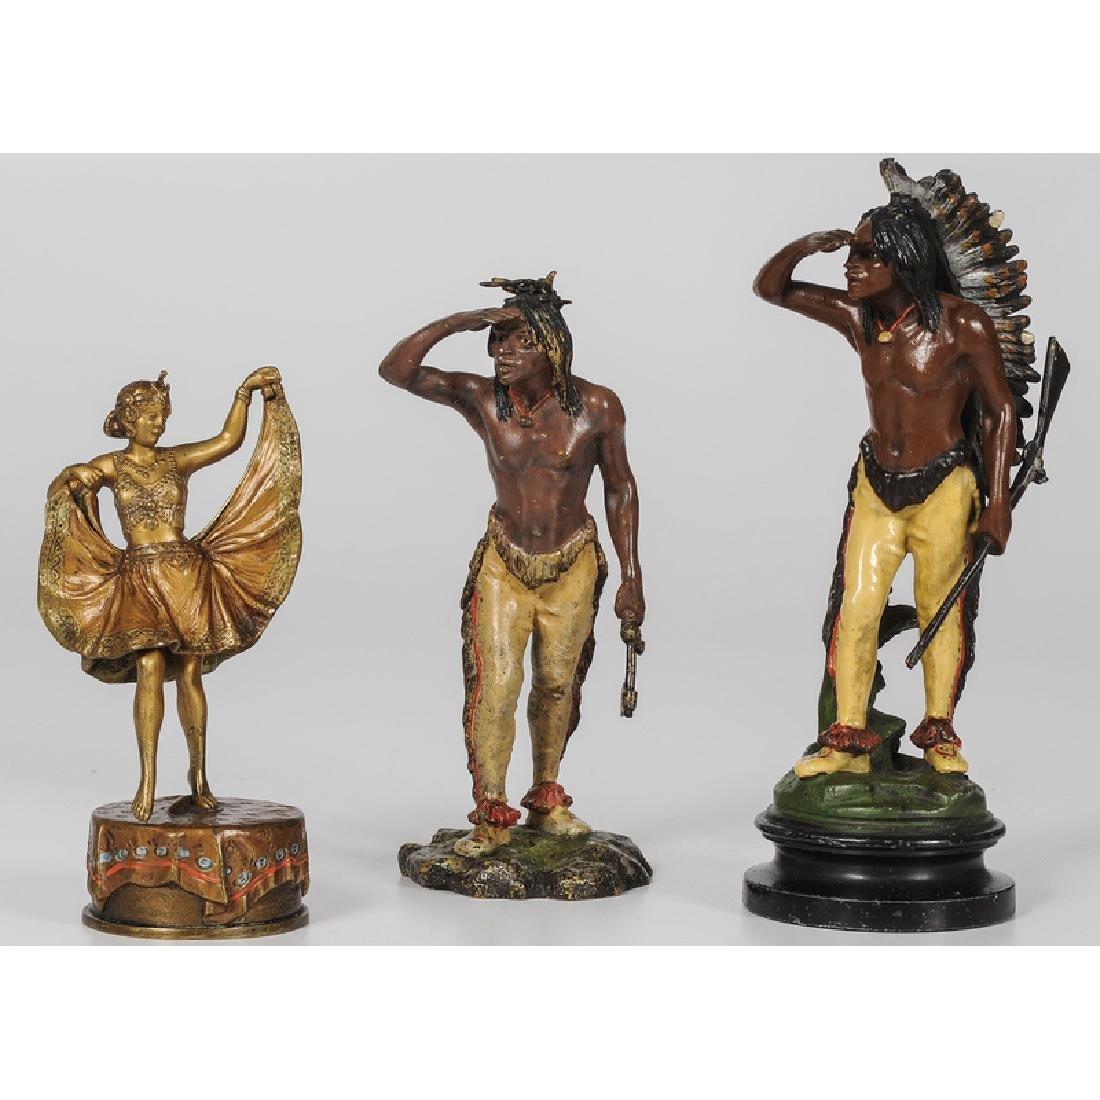 Franz Bergmann Cold Painted Bronzes, Plus